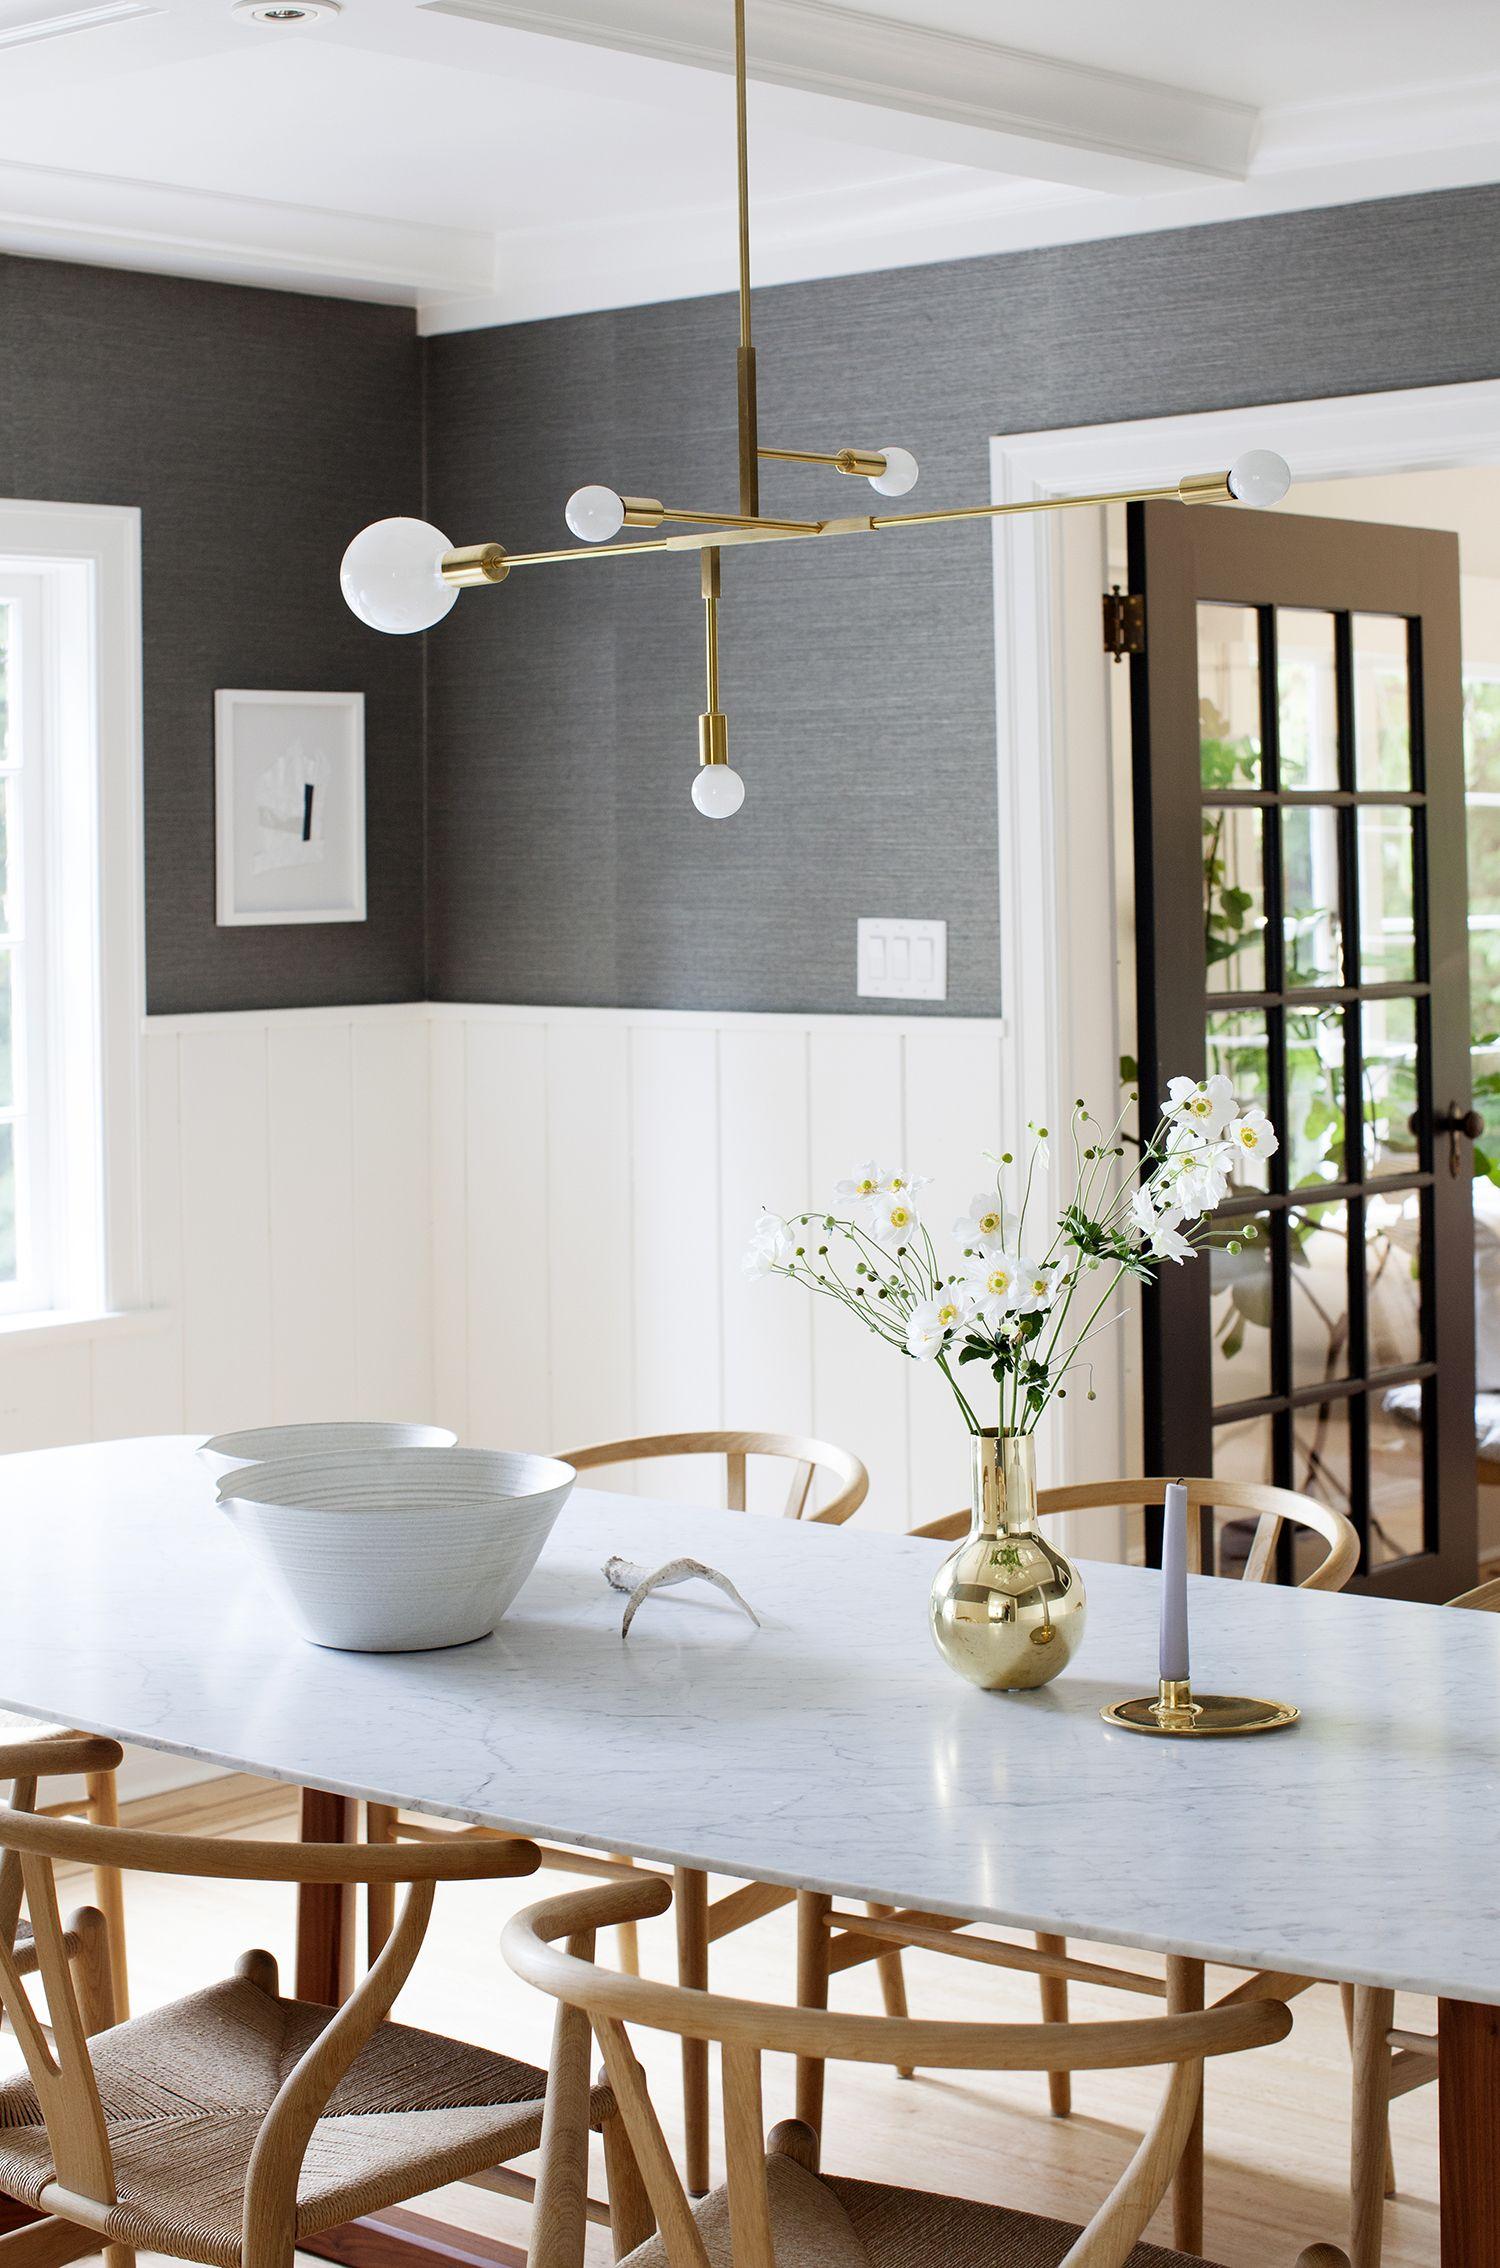 25 Exquisite Corner Breakfast Nook Ideas In Various Styles Dining Room Design Modern Modern Dining Room Mid Century Dining Room